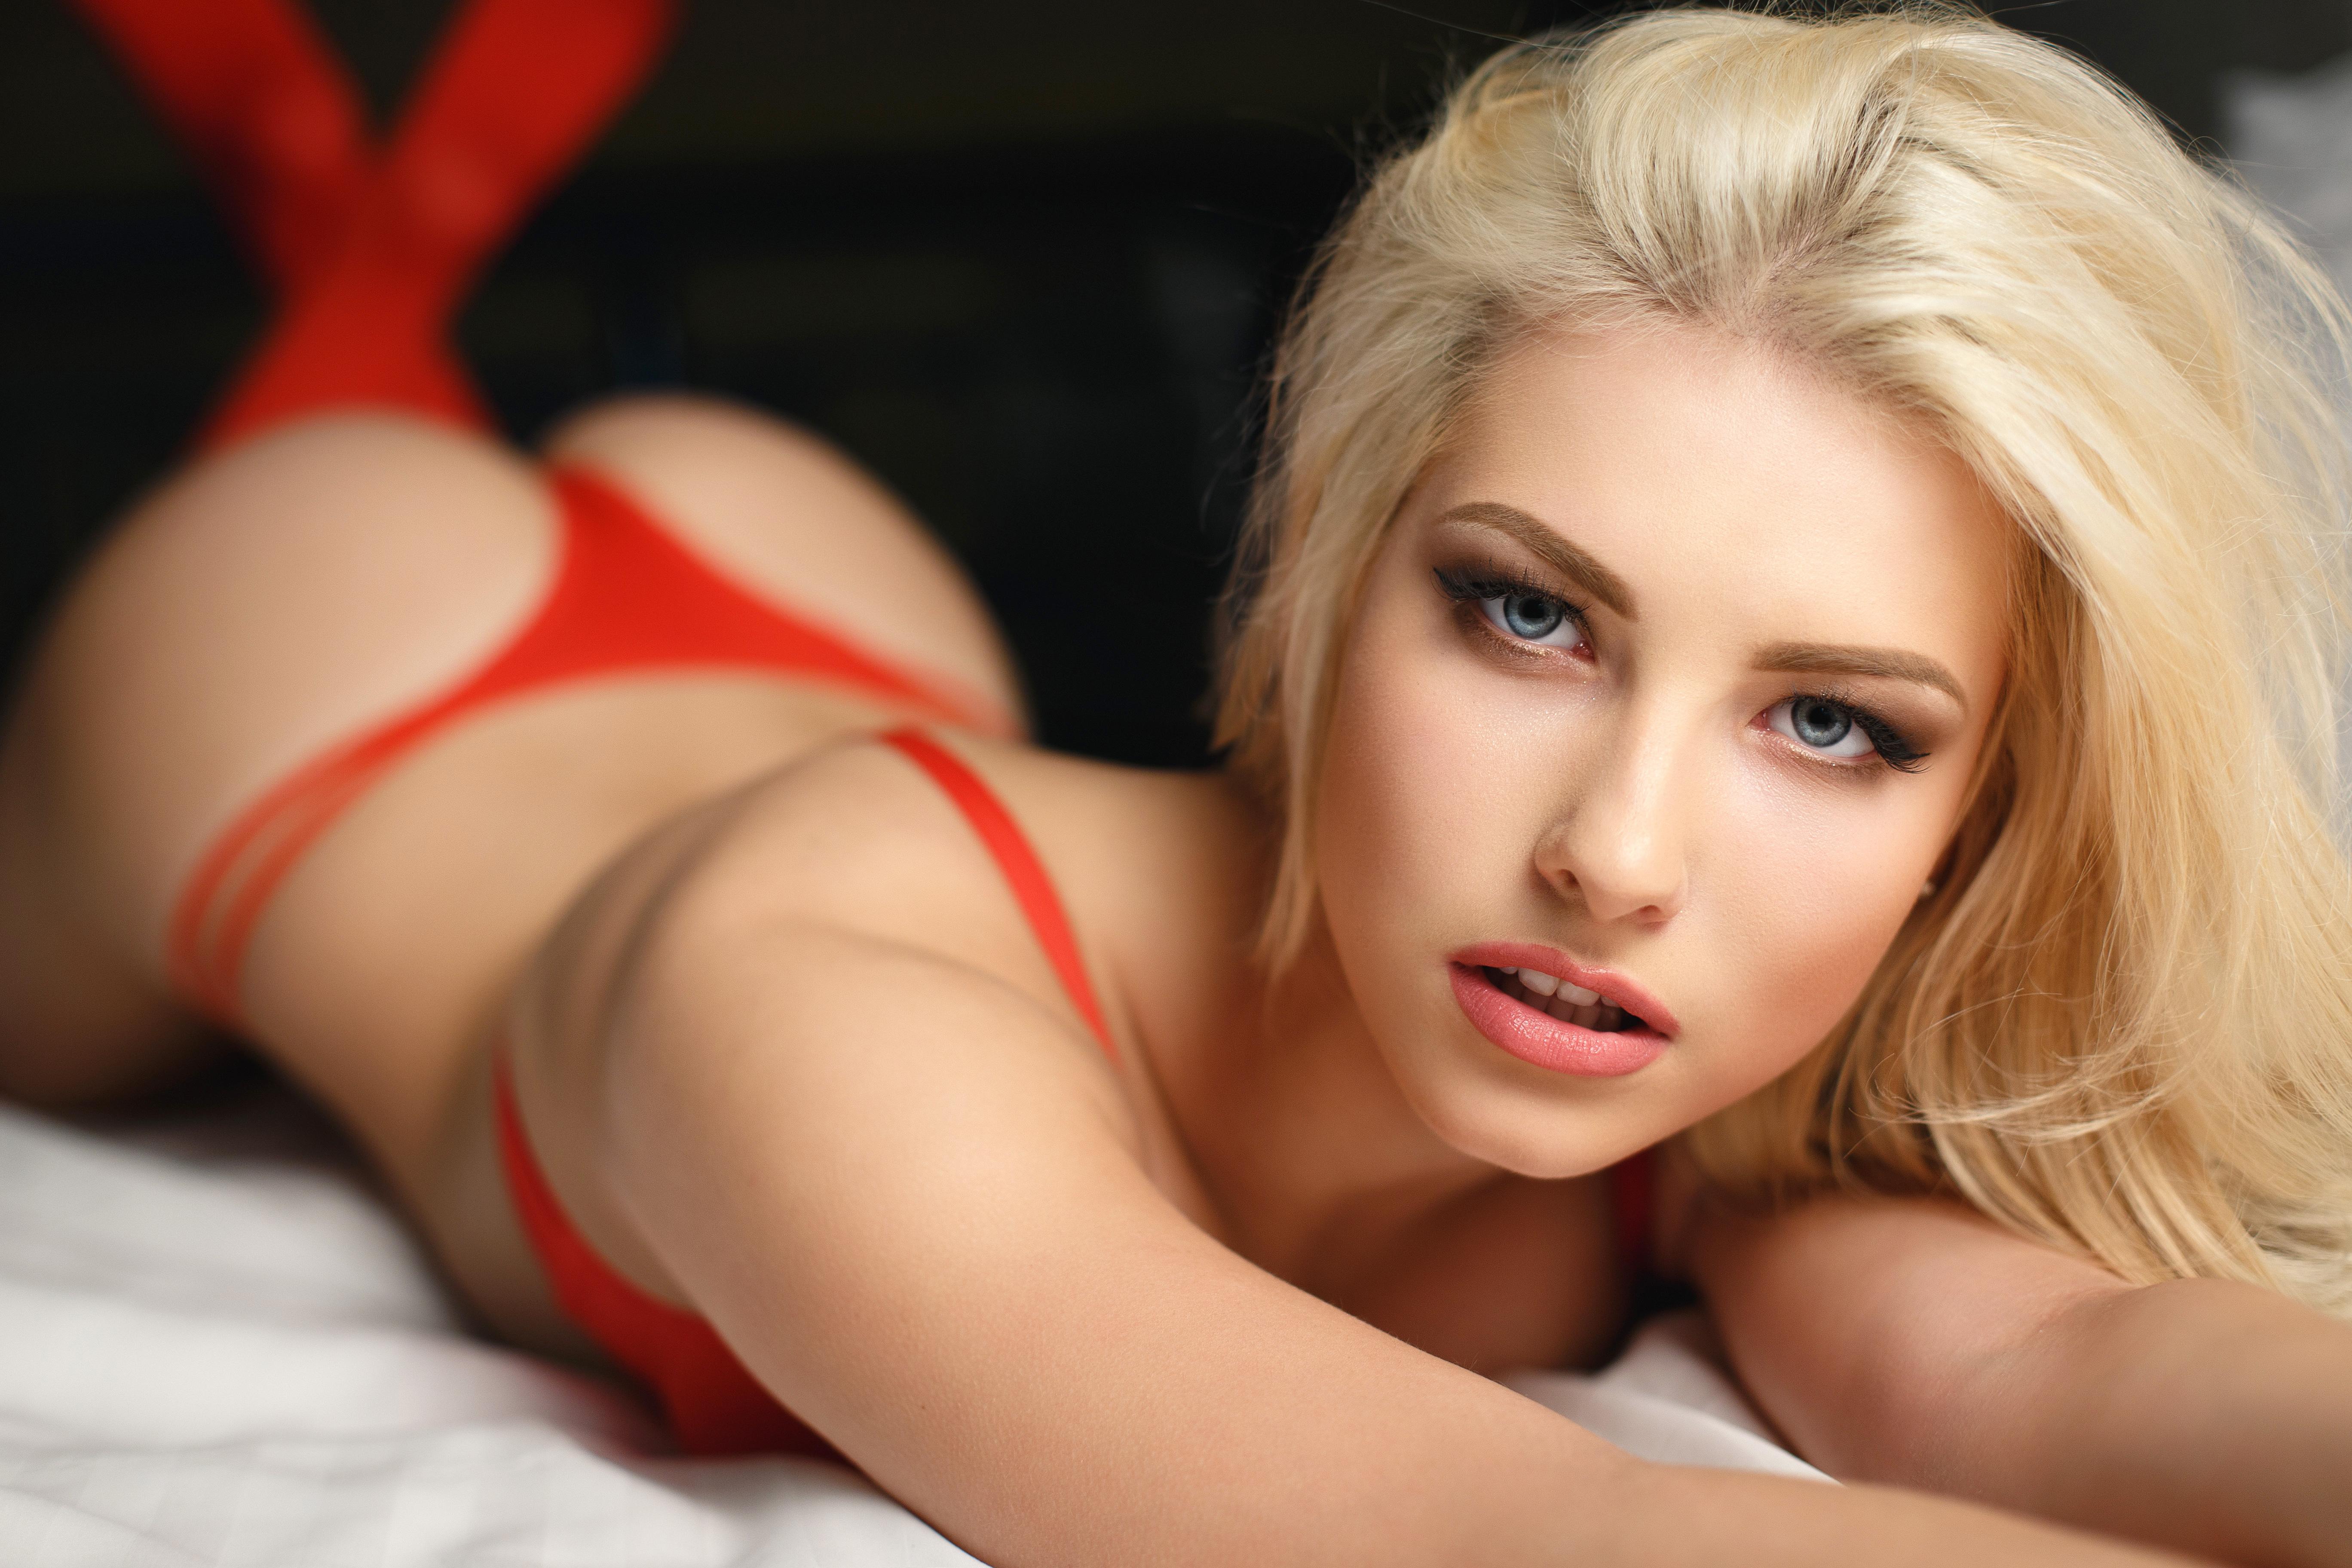 Portrait sexy blonde image photo